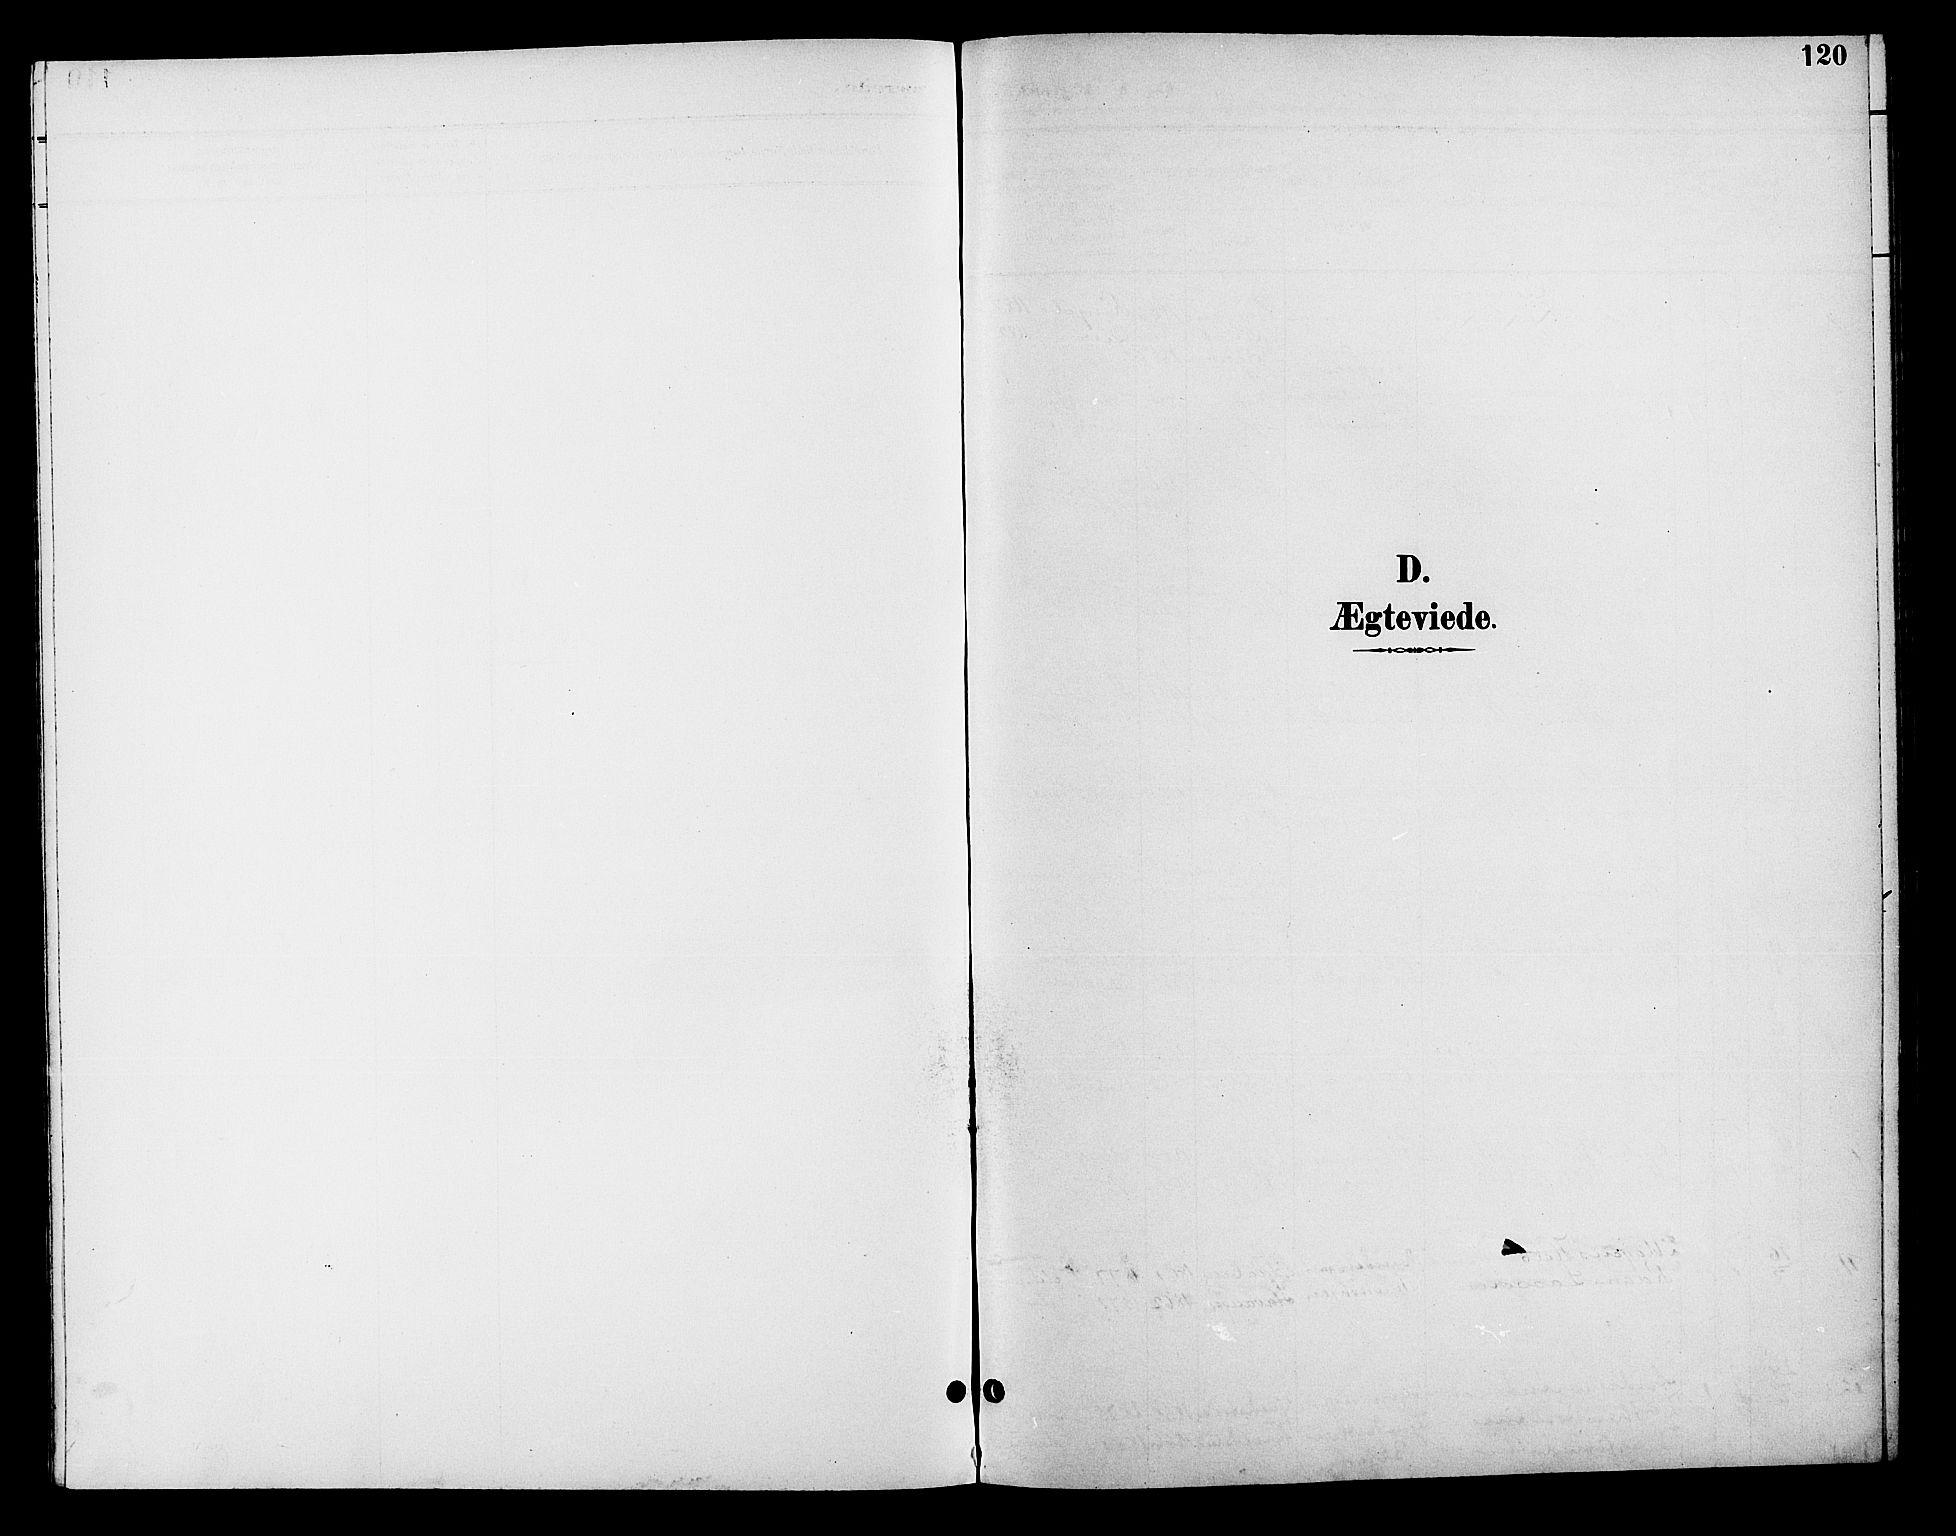 SAH, Fåberg prestekontor, H/Ha/Hab/L0008: Parish register (copy) no. 8, 1891-1900, p. 120